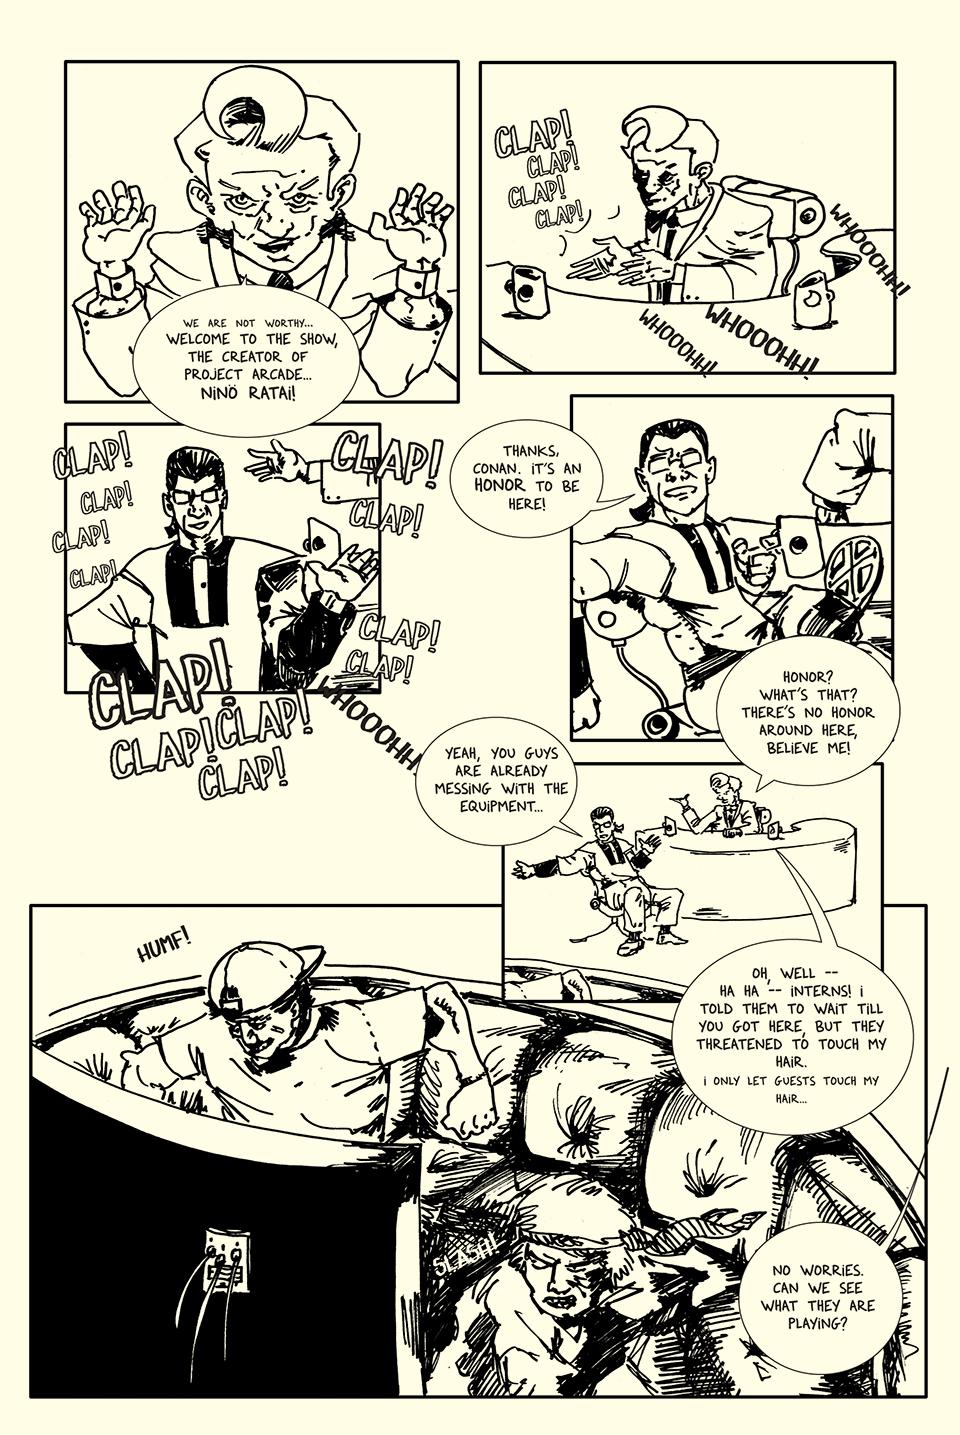 Page 2 art by Roho